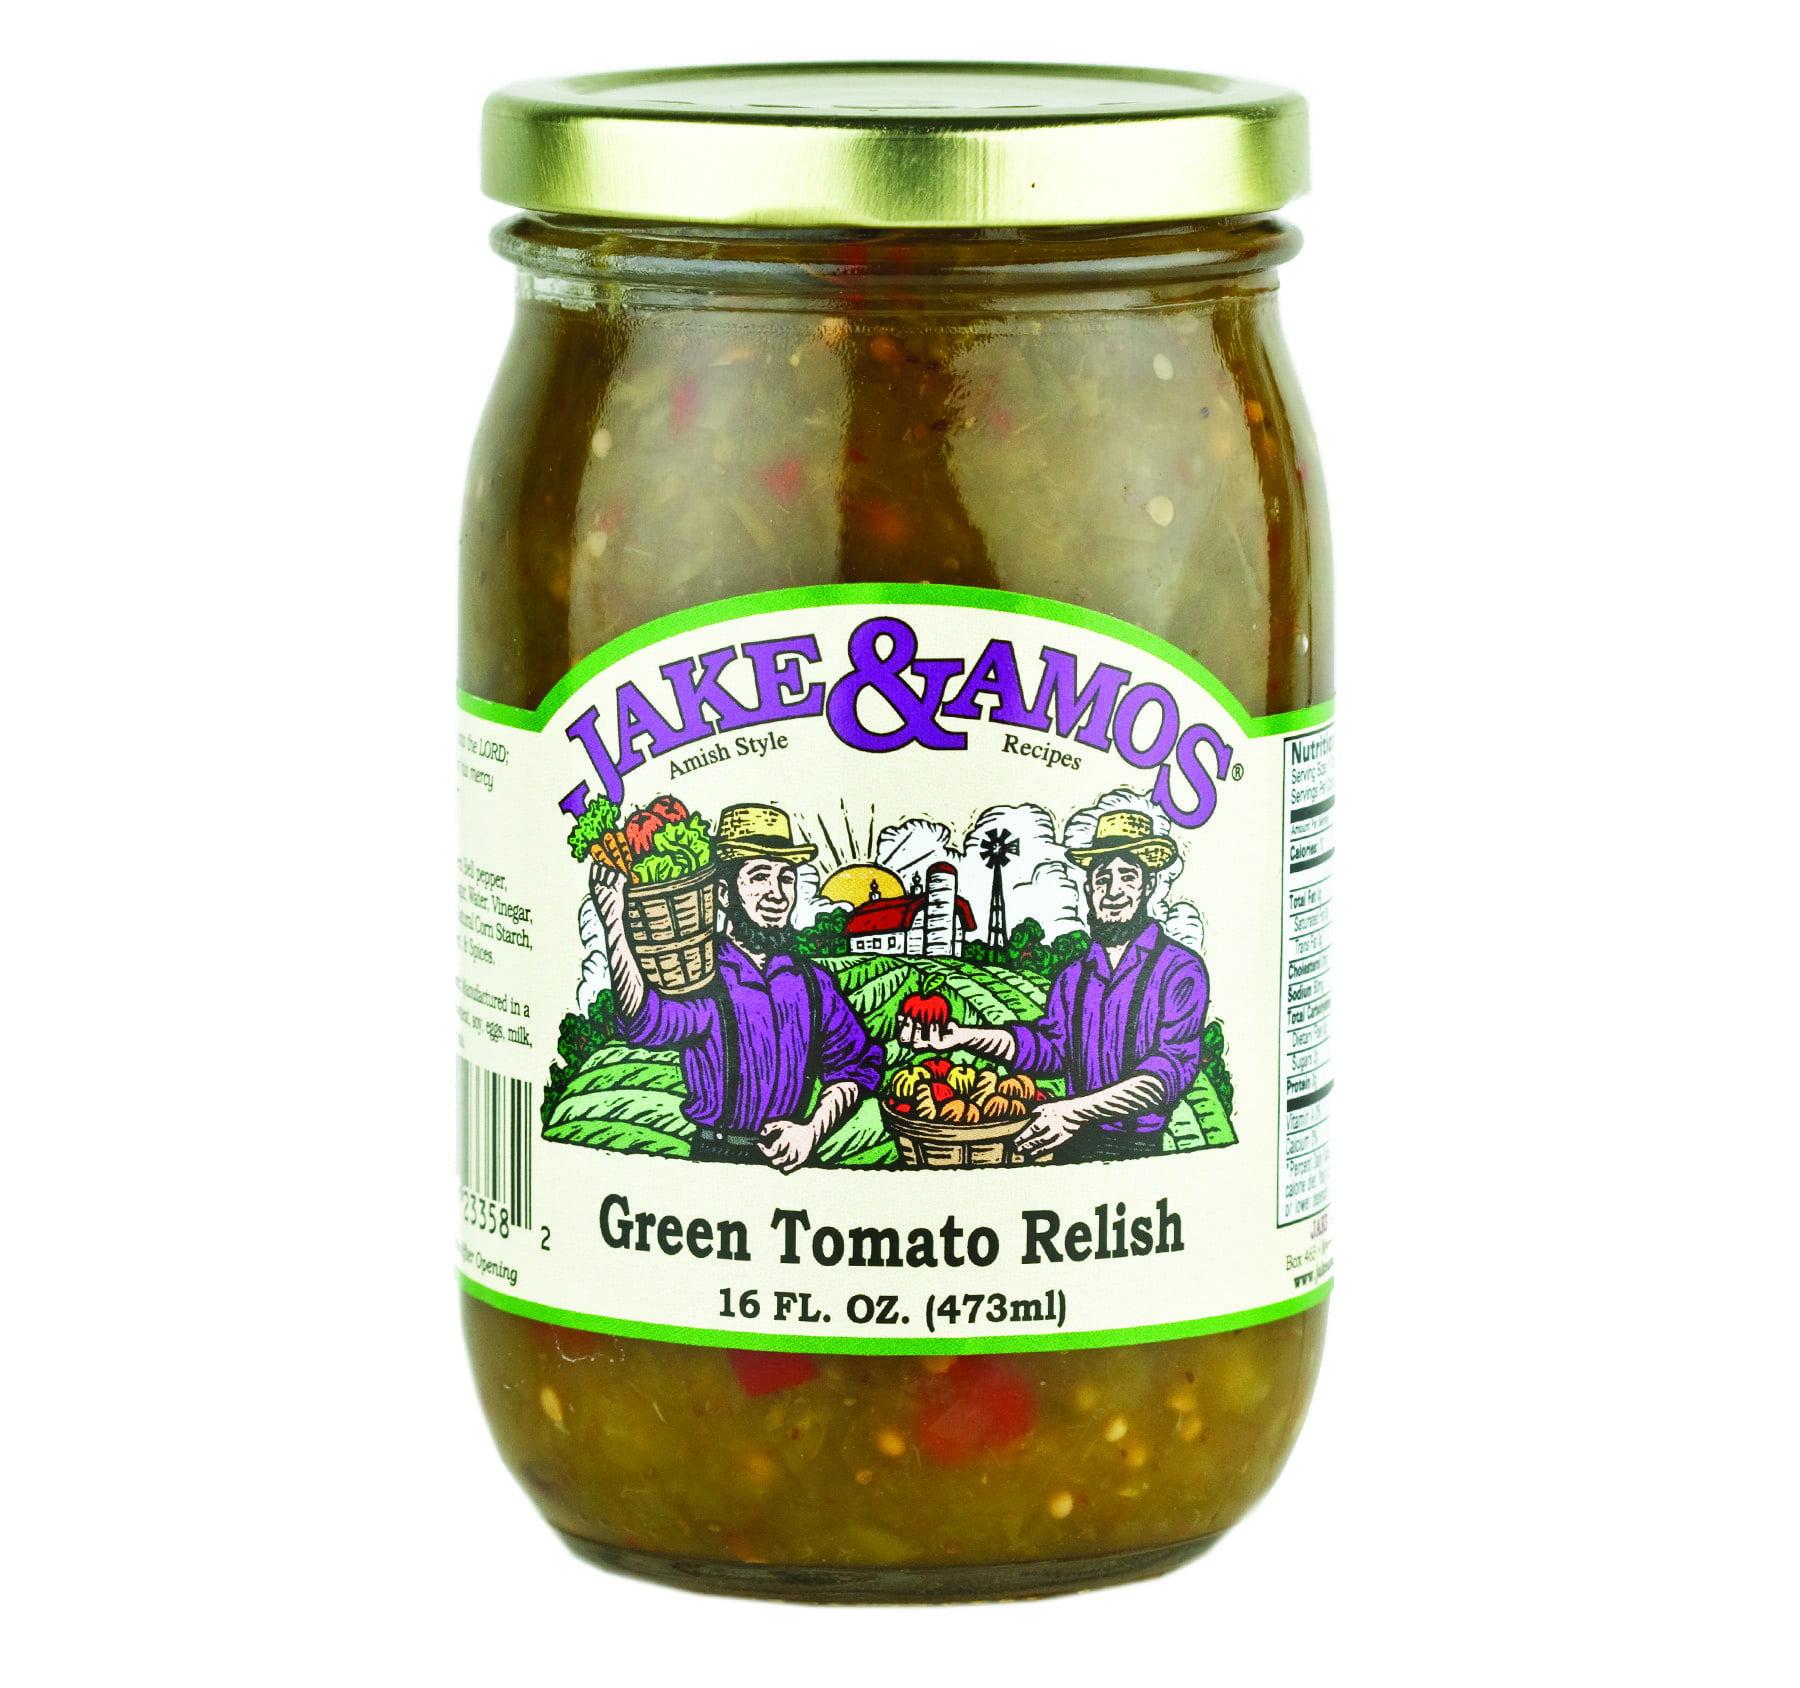 Jake & Amos Green Tomato Relish 16 oz. (3 Jars)